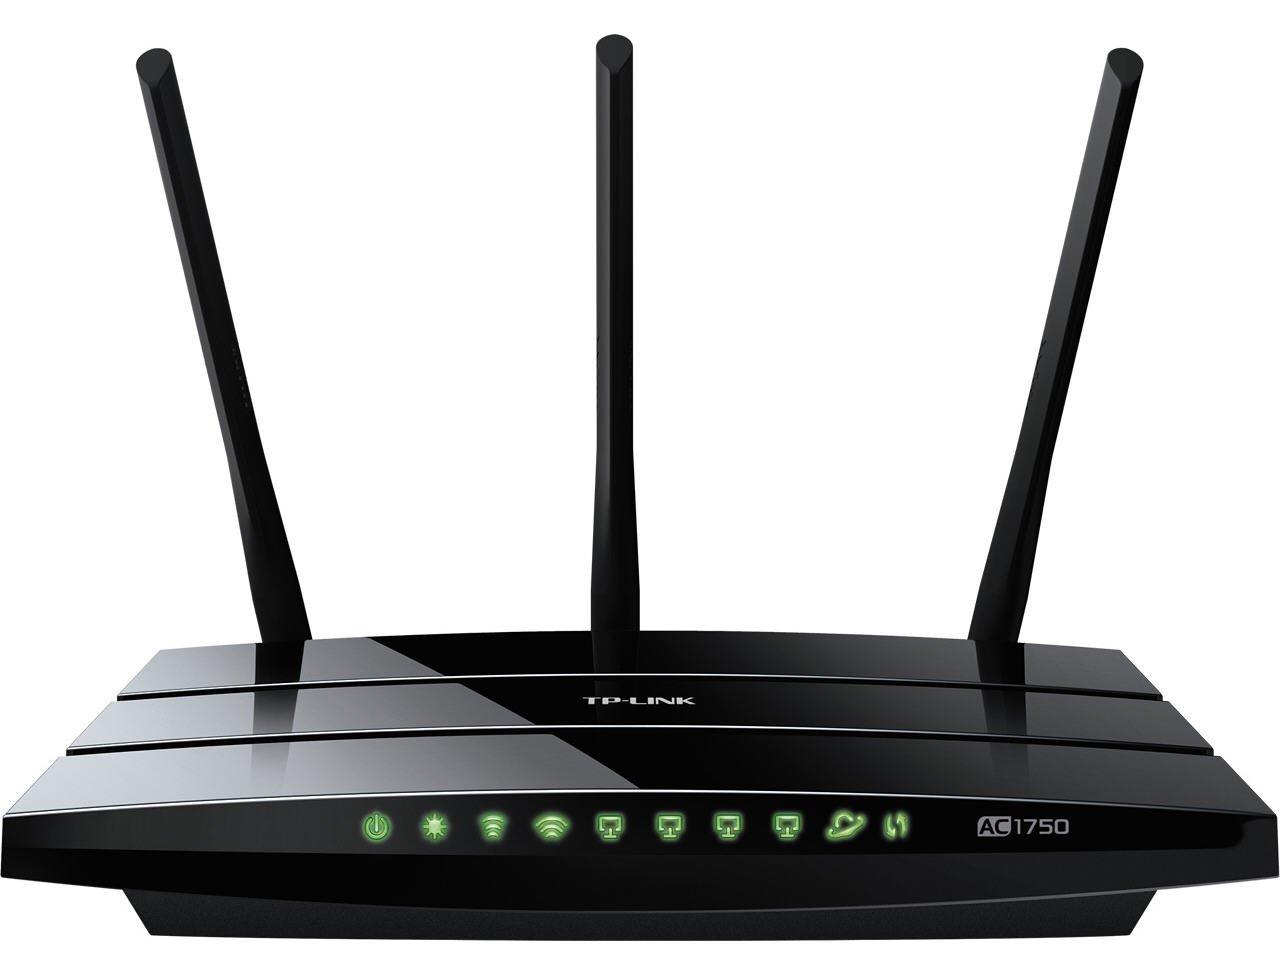 TP-LINK Archer C7 AC1750 Dual Band Wireless AC Gigabit Router, 2.4GHz 450Mbps+5Ghz 1300Mbps, 2 USB Port, IPv6, Guest Network